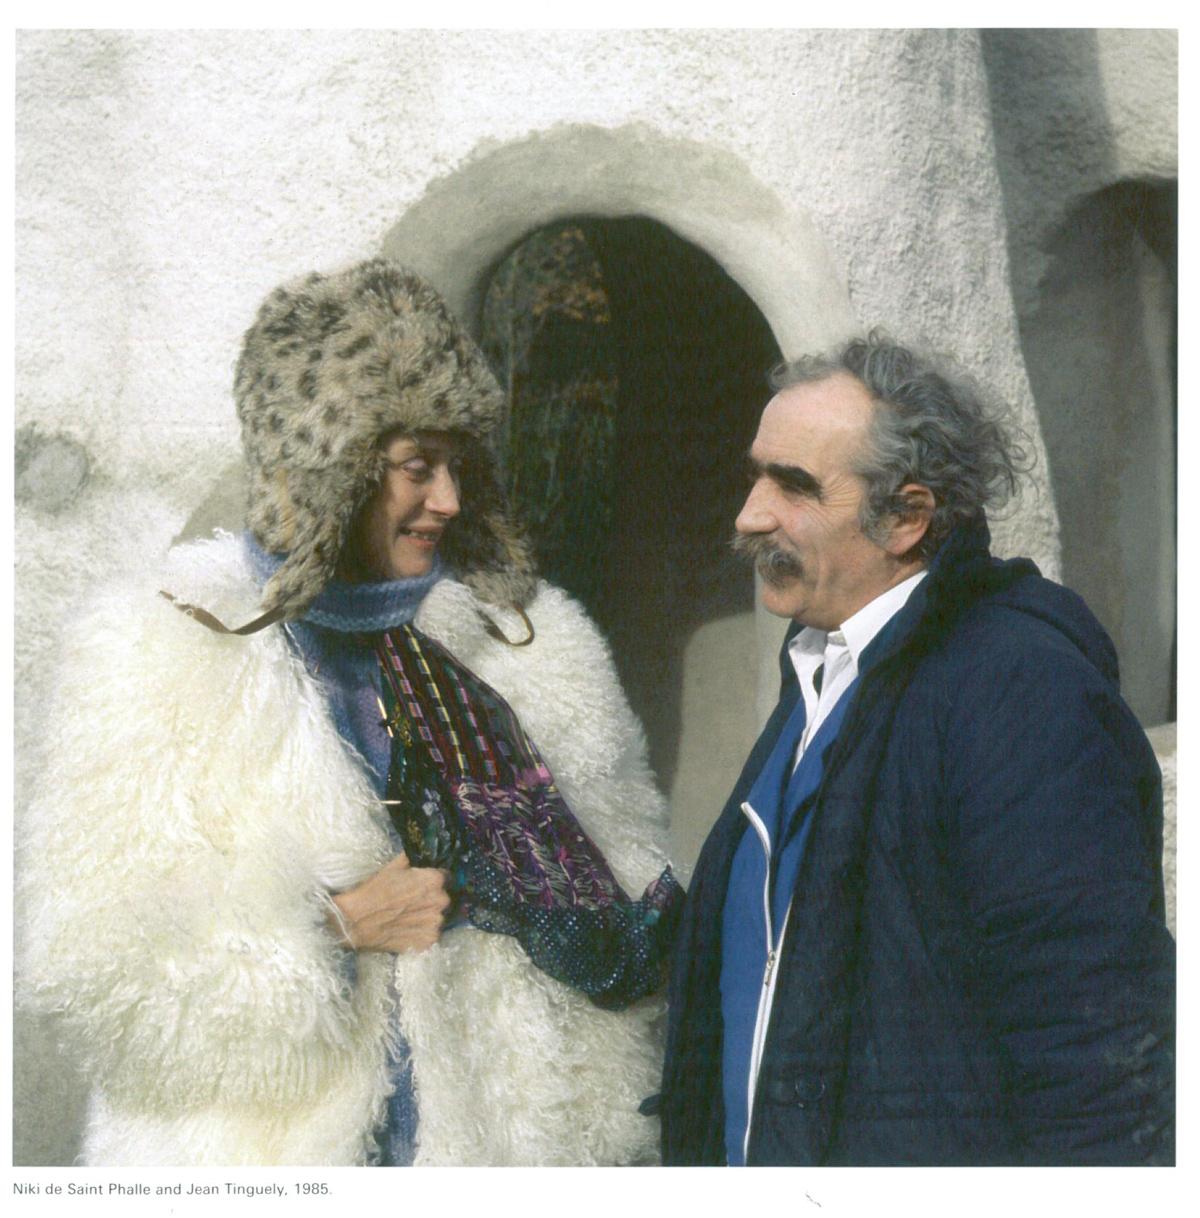 Niki de Saint Phalle and Jean Tinguely, in 1985, as the Tarot Garden was being constructed. Image courtesy of Il Fondazione Giardino Dei Tarocchi.